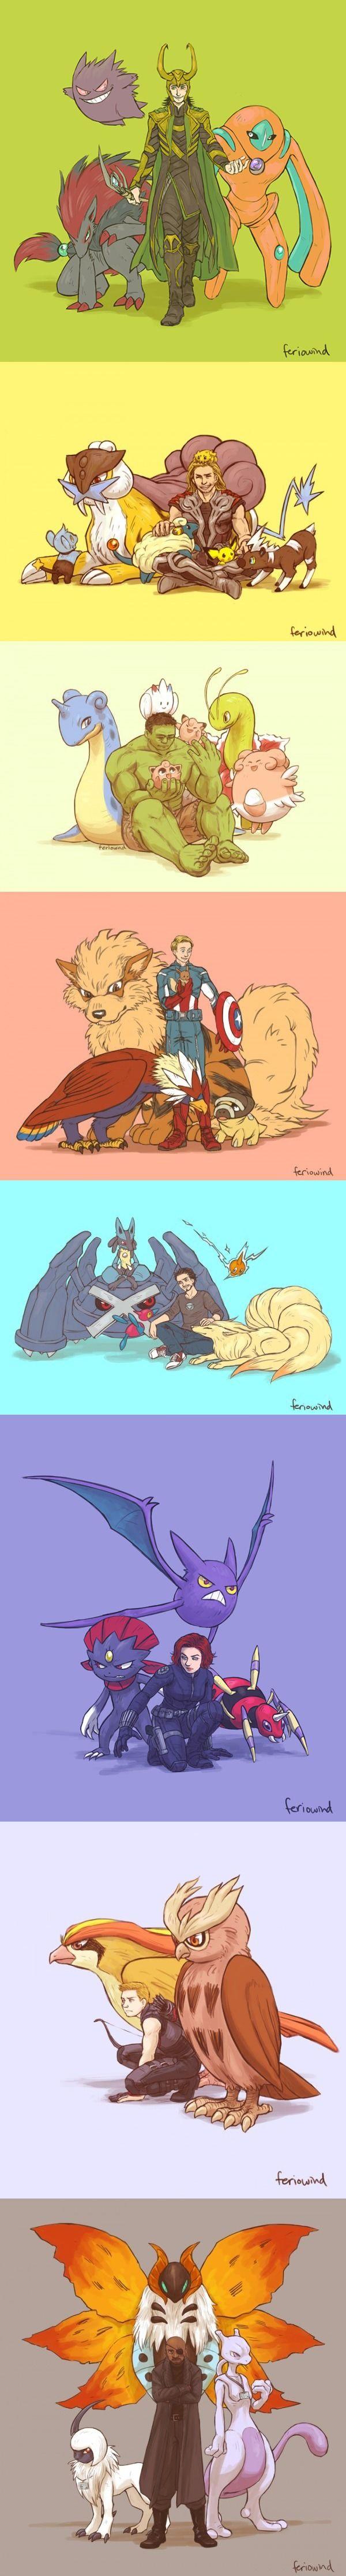 If the Avengers had Pokemon